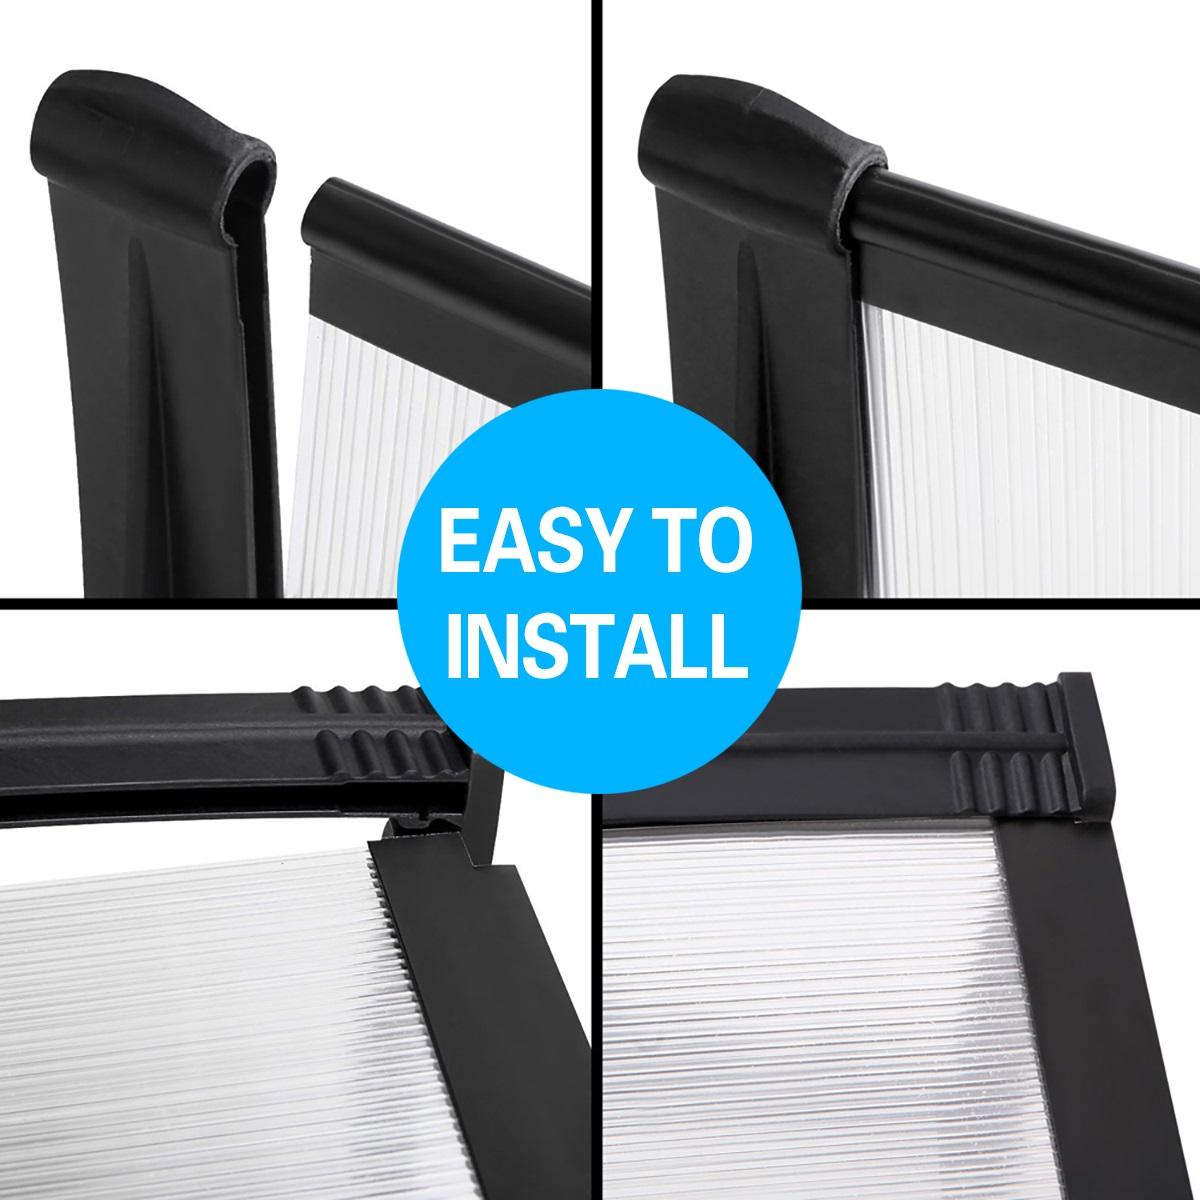 DIY-Window-Door-Awning-Canopy-Patio-UV-Rain-Cover-Outdoor-Sun-Shield-1m-x-1-2m